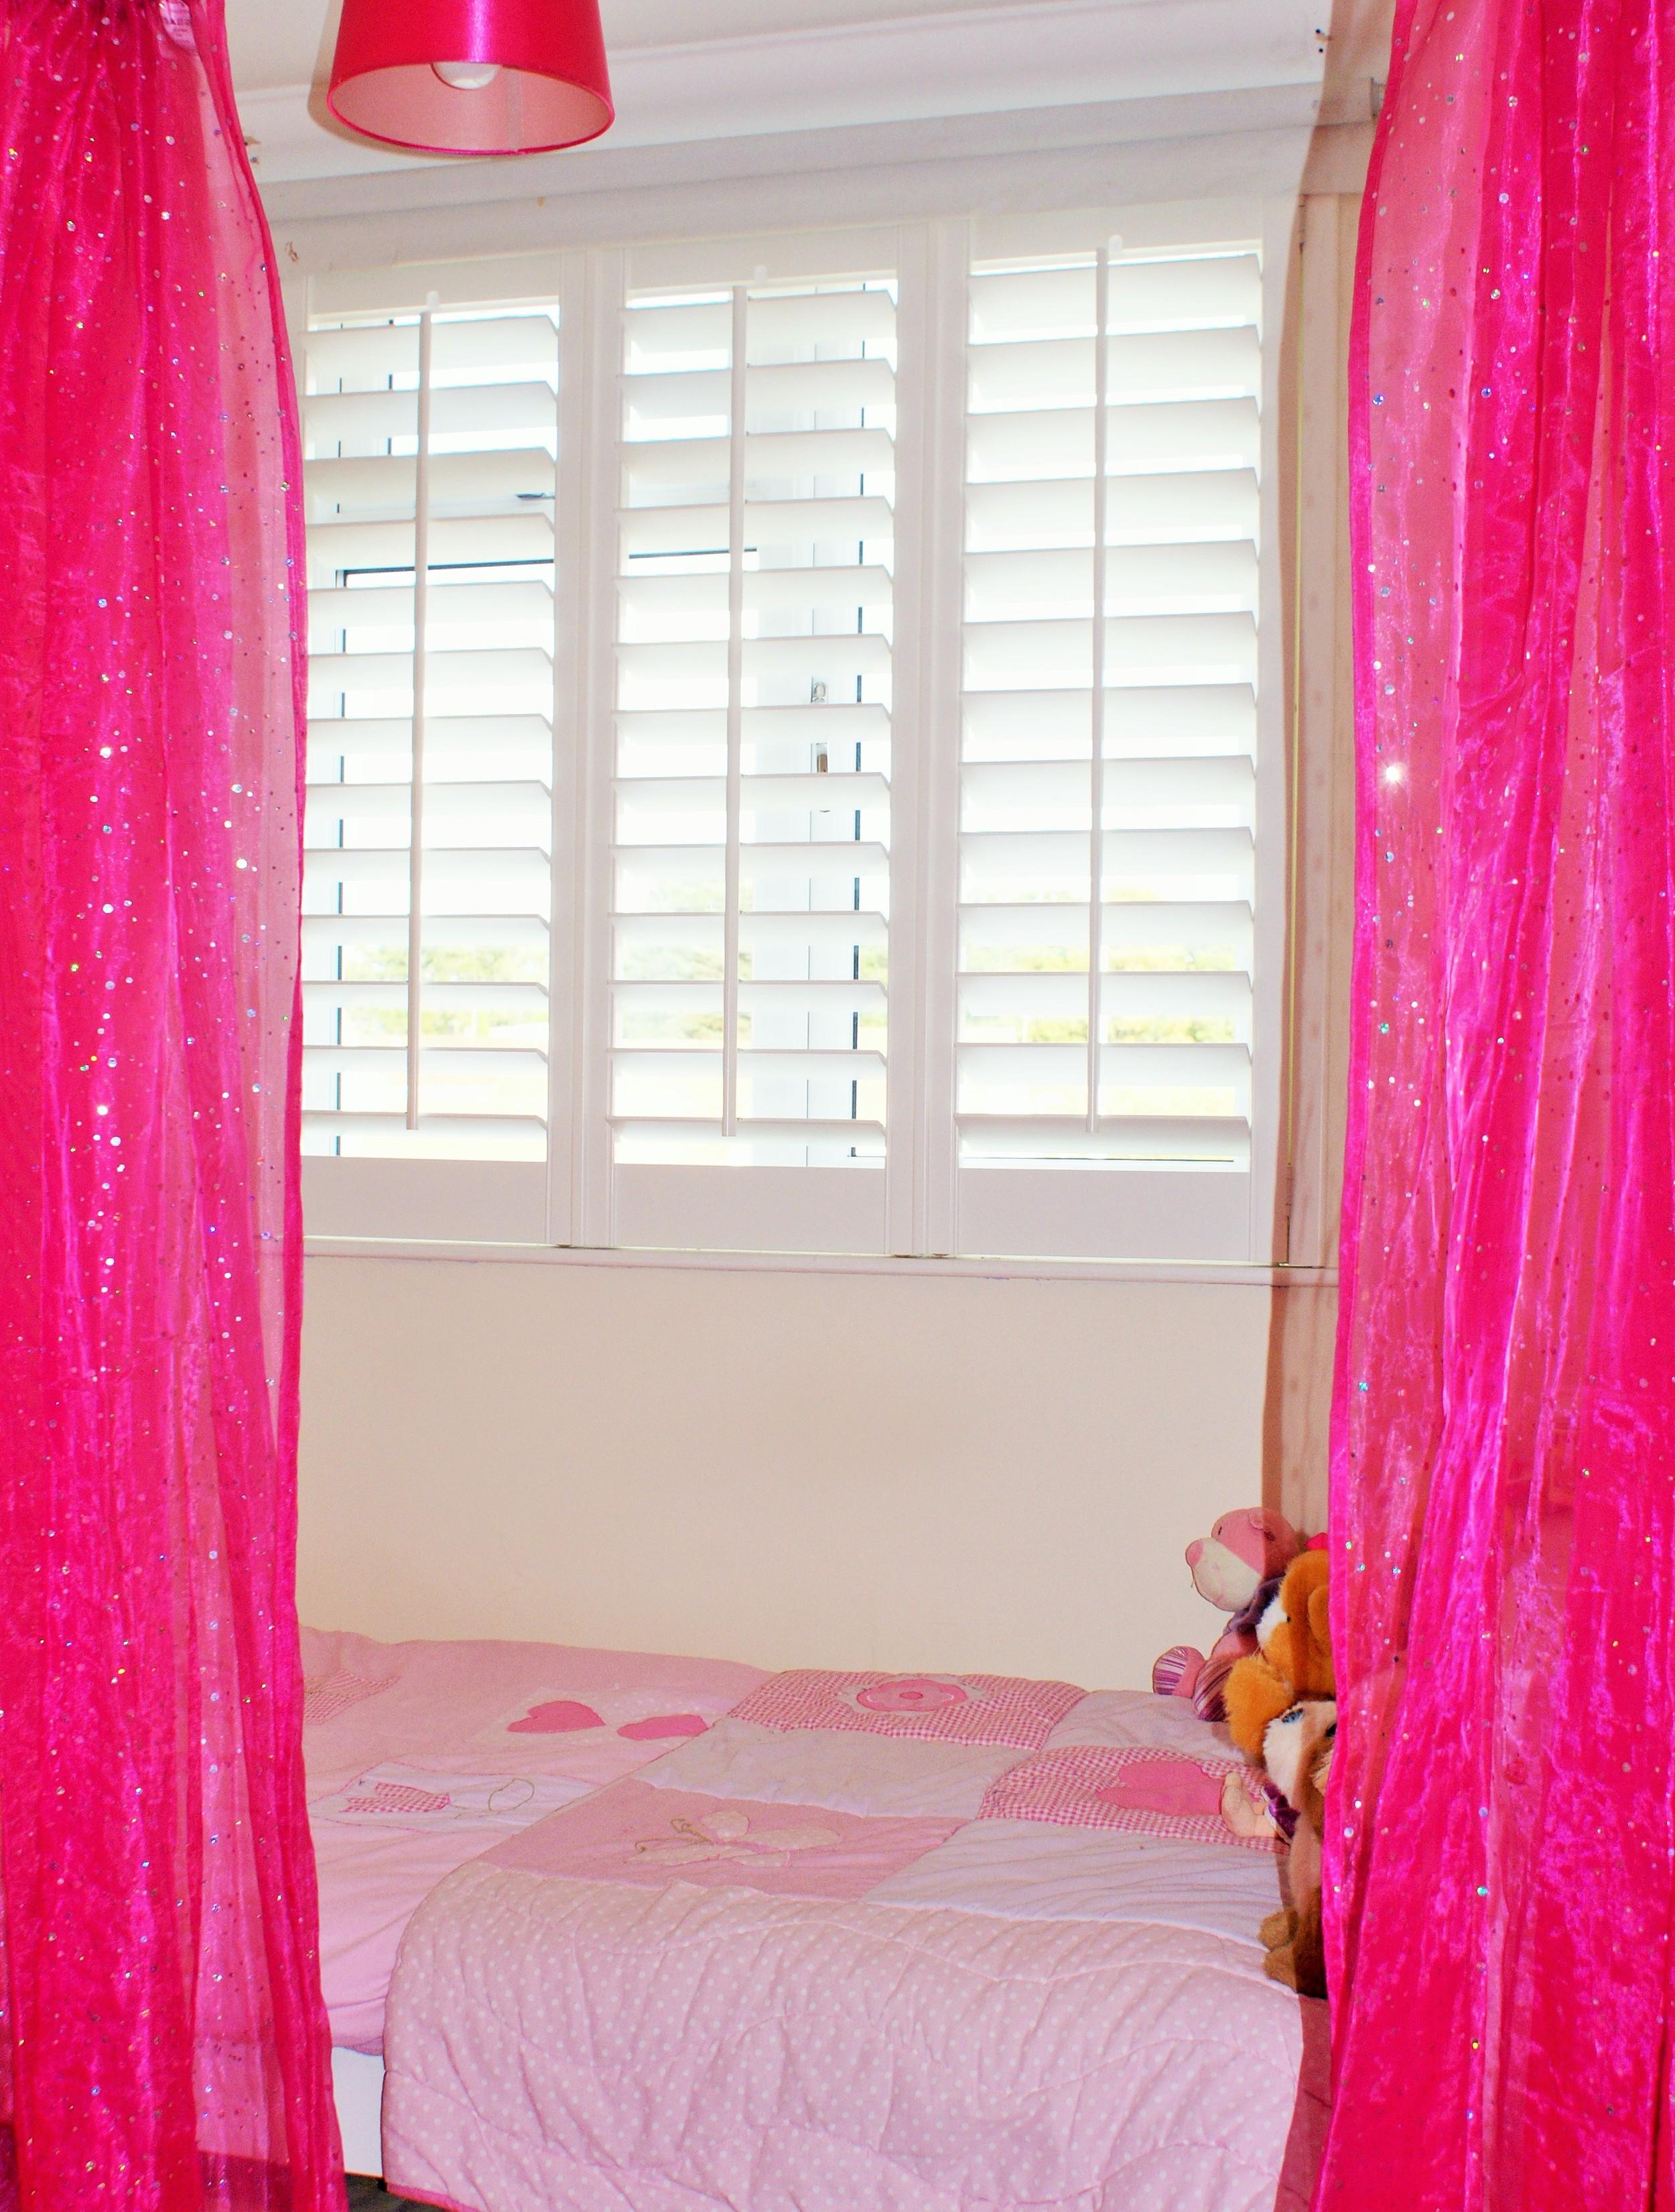 girls-bedroom-ideas-child-safe-cheap-interior-window-shutters-blinds-£270.JPG